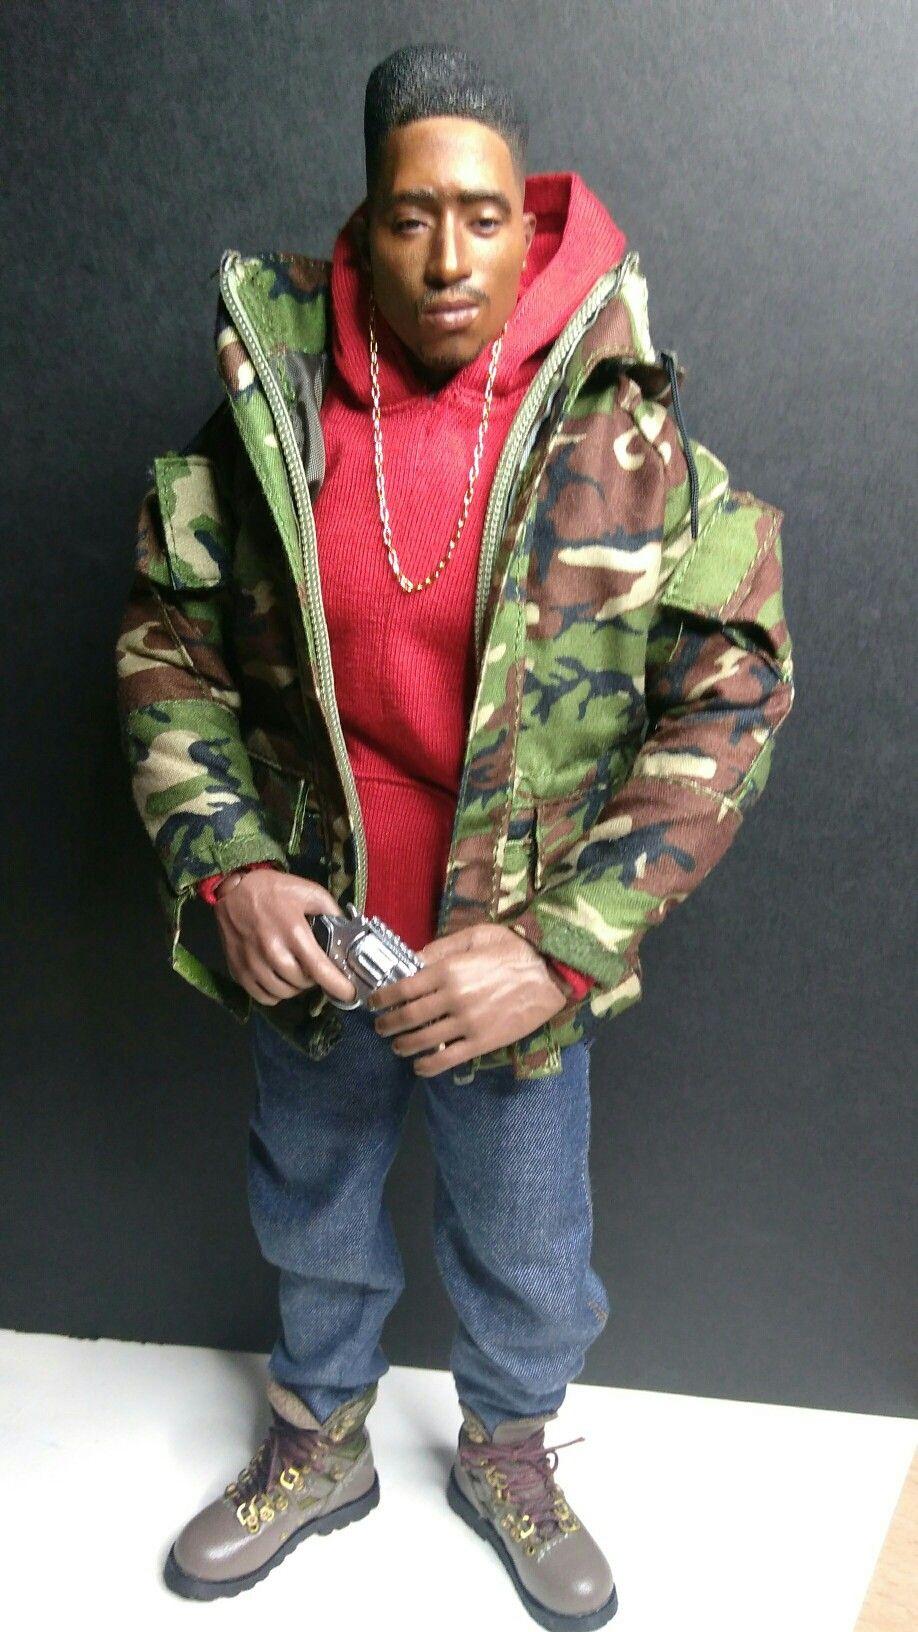 fcb81636b Juice x Tupac | ACTION! in 2019 | Hip hop, Tupac shakur, 2pac